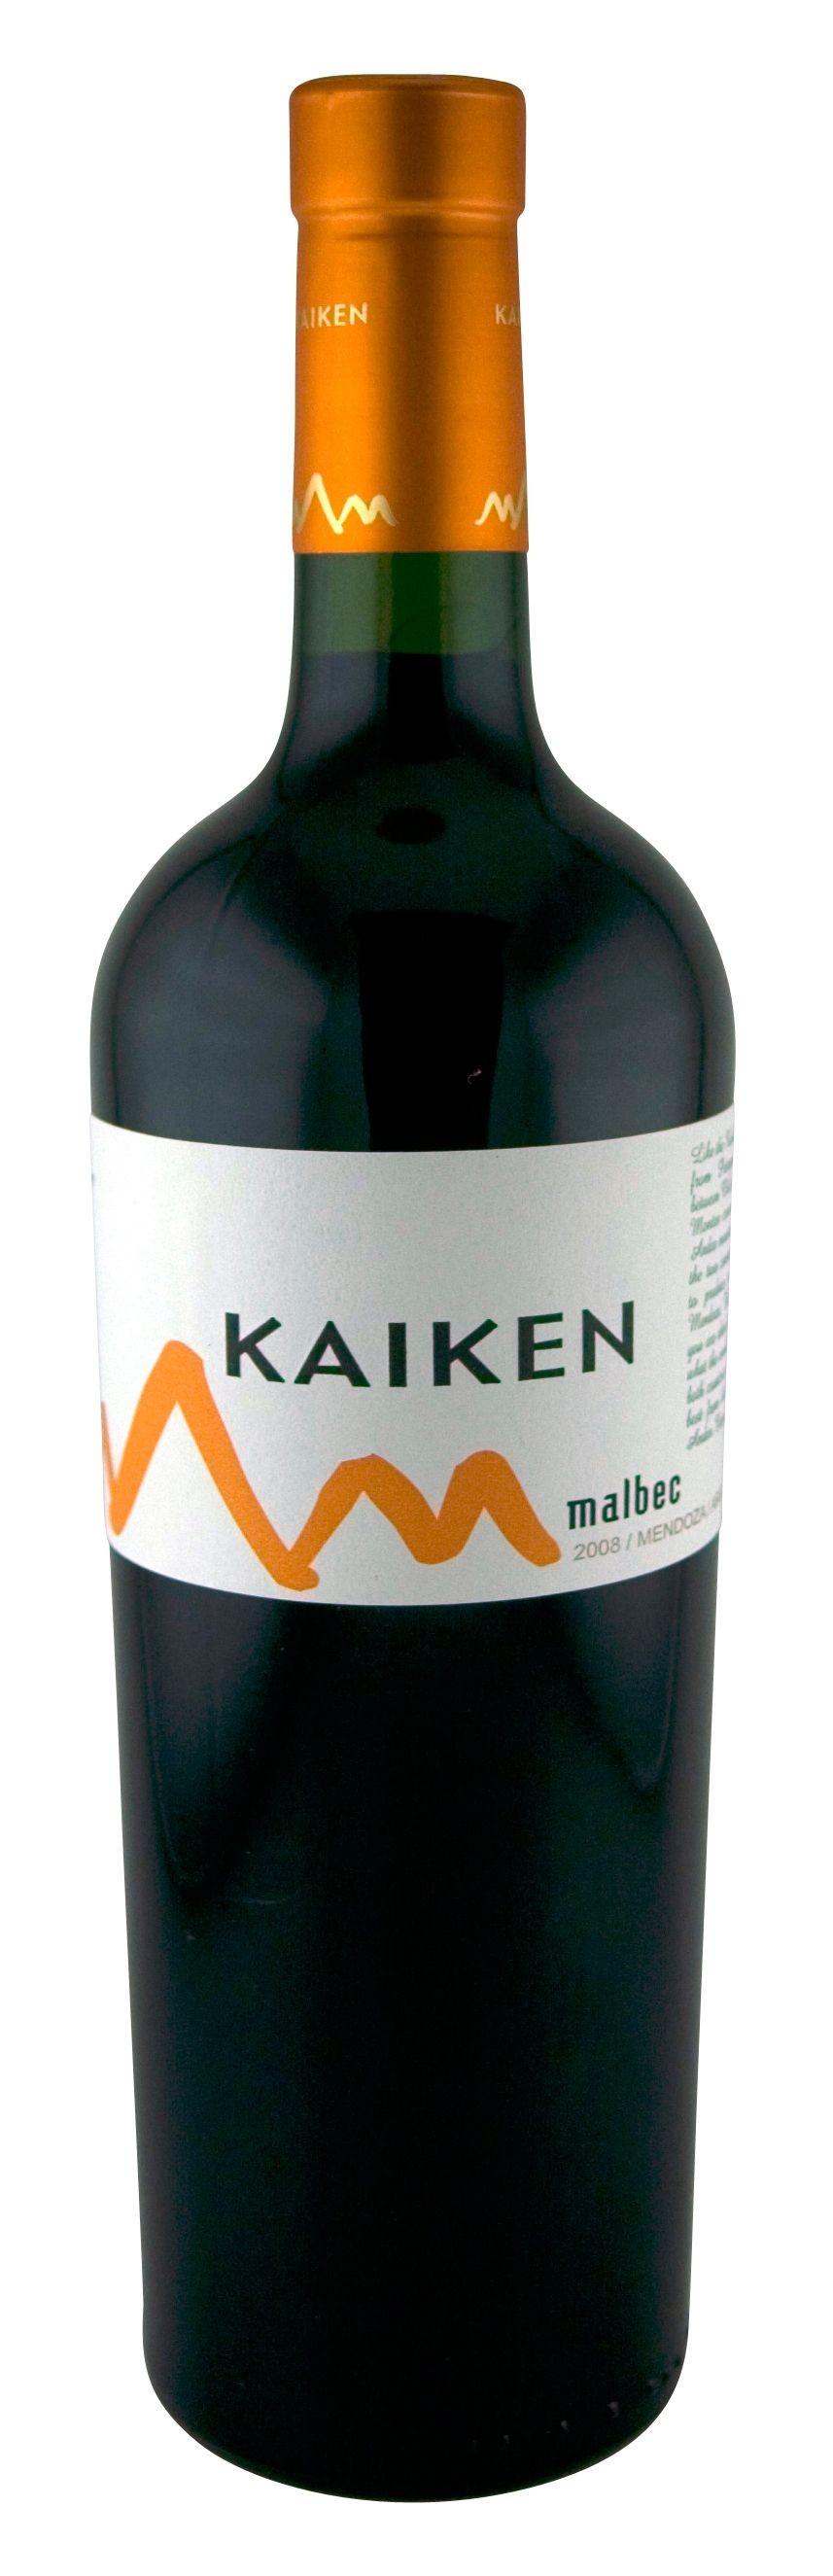 Kaiken - Malbec Bonarda Petit Verdot Terroir Series, 2018